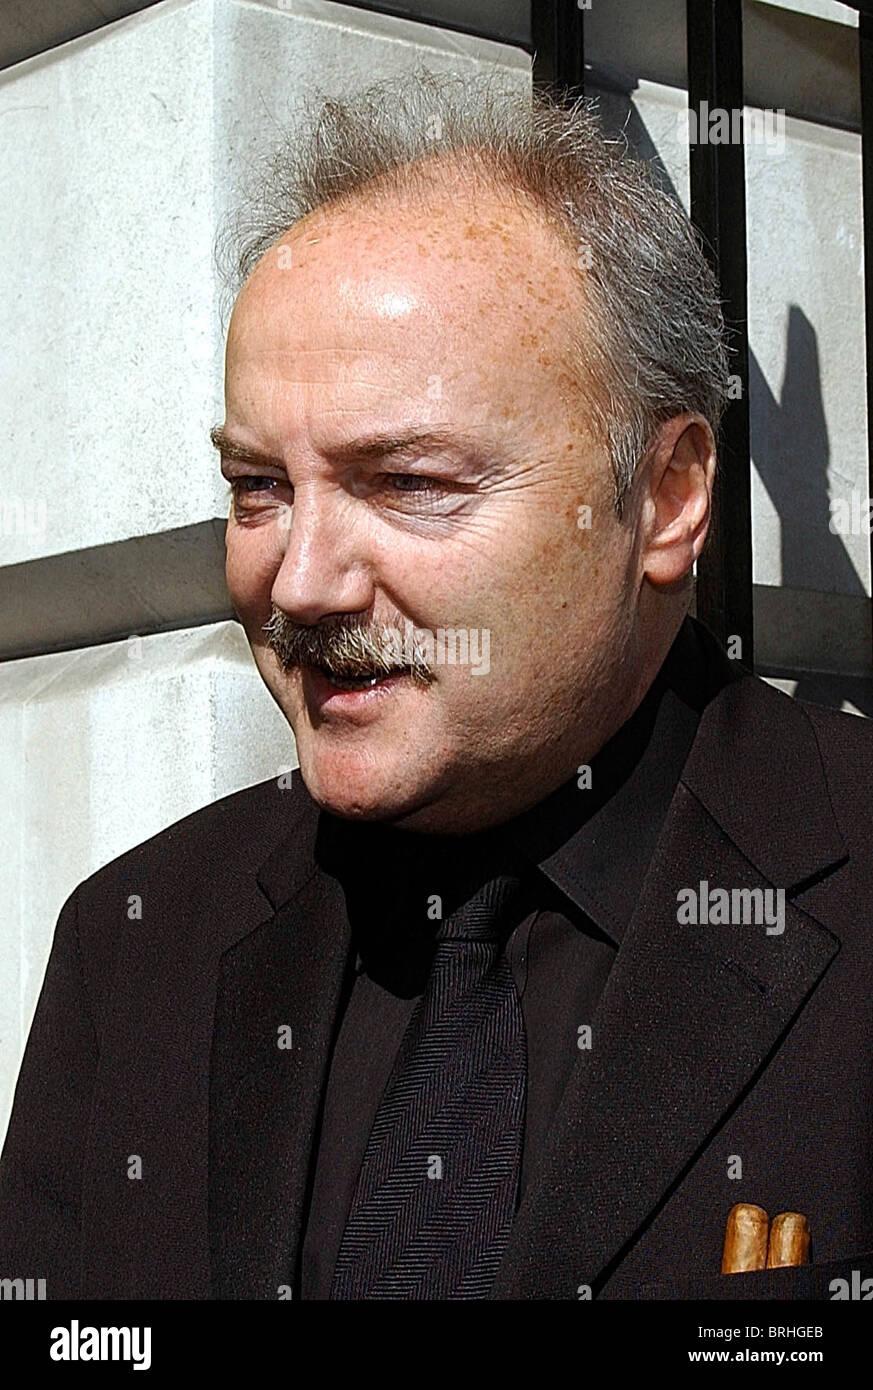 MP George Galloway à l'anti-war demo dans Grosvenor Square, London, 5-4-2003. Photo de John Robertson-Tel.07850 Photo Stock